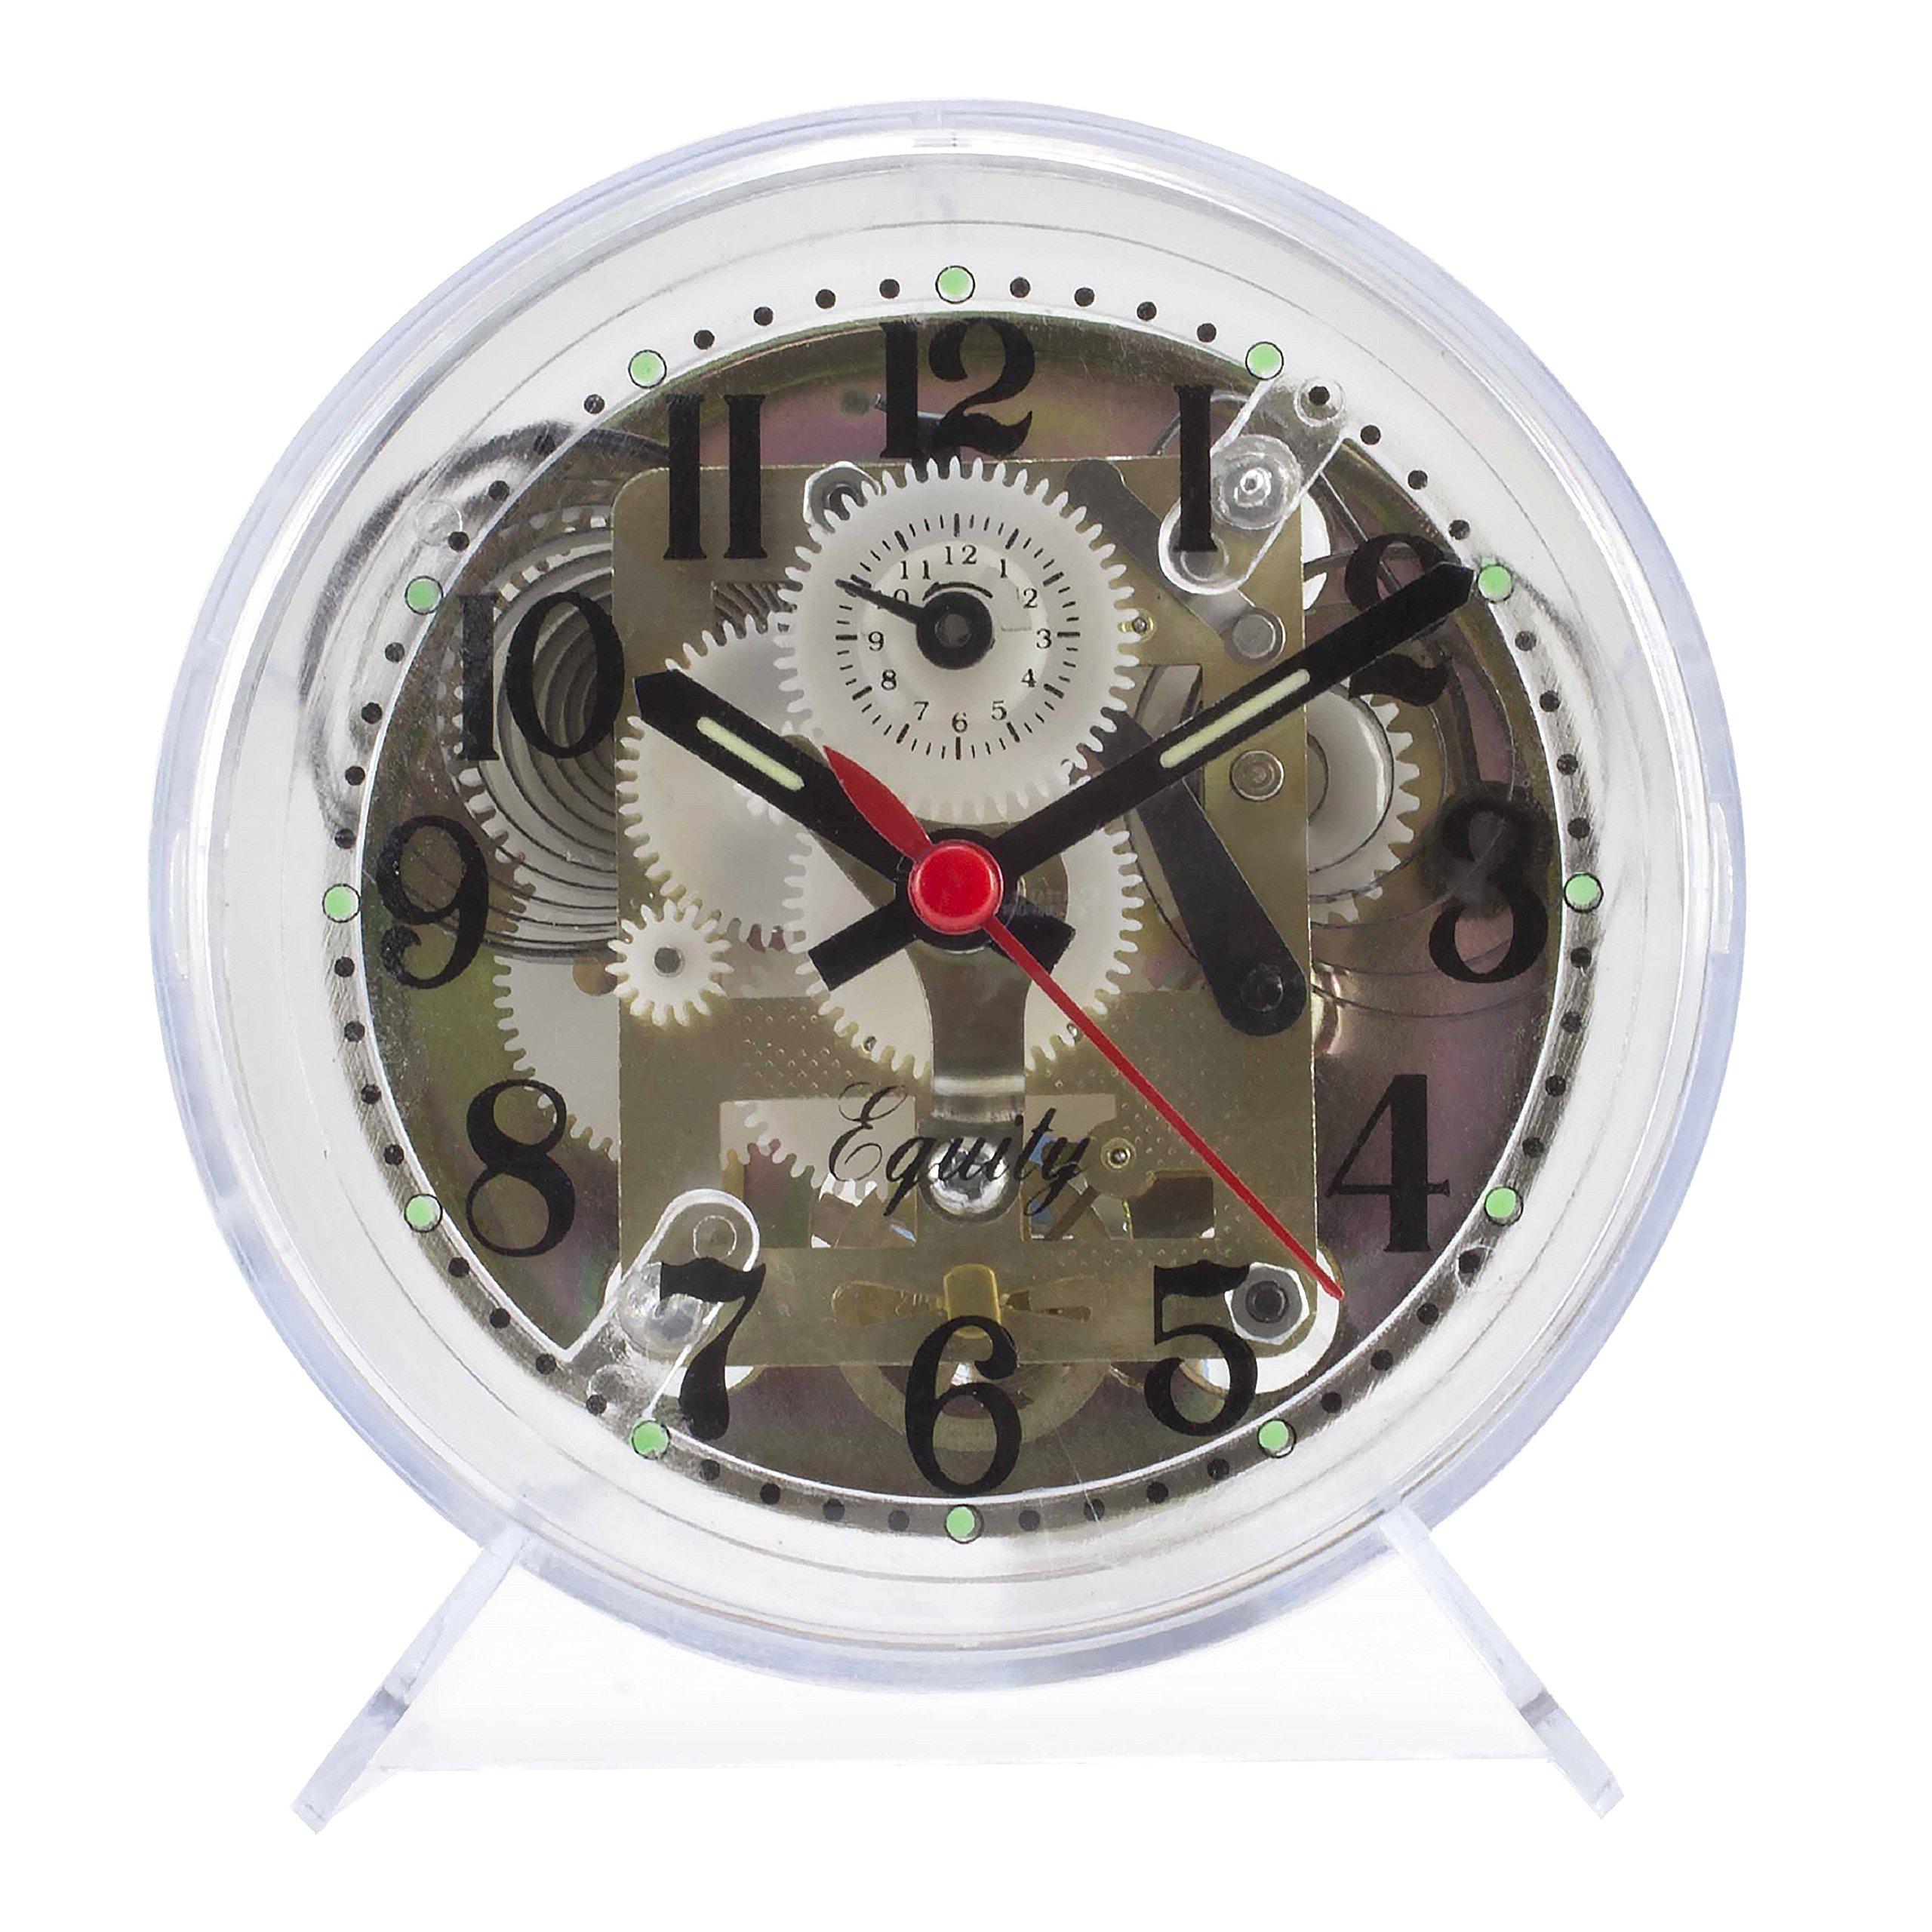 Equity by La Crosse Keywound Alarm Clock (Black)